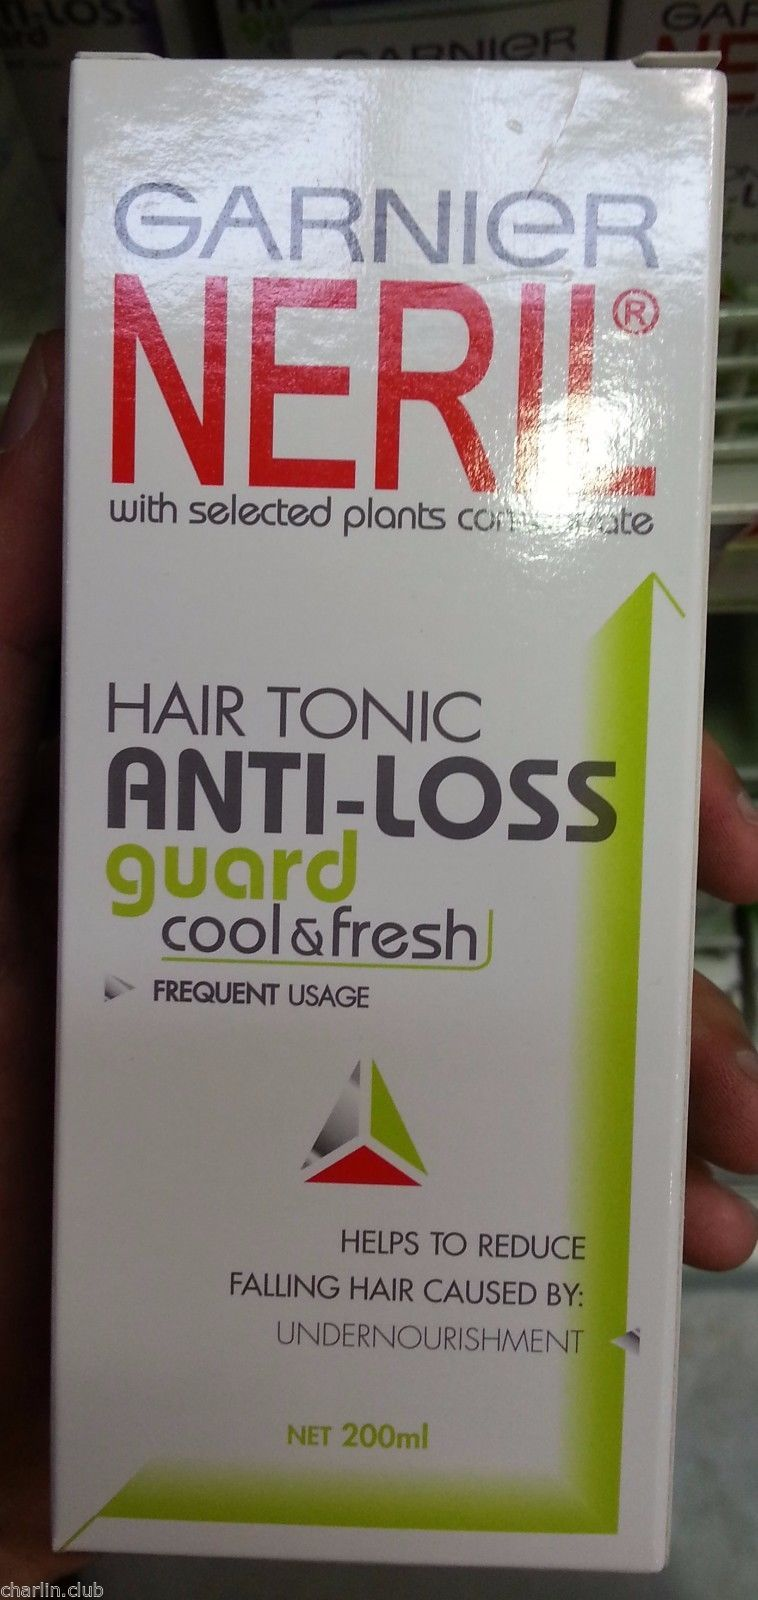 Garnier Neril Hair Tonic Antiloss 200 Ml Daftar Harga Terlengkap Anti Loss Guard Cool Fresh Contains 200ml1